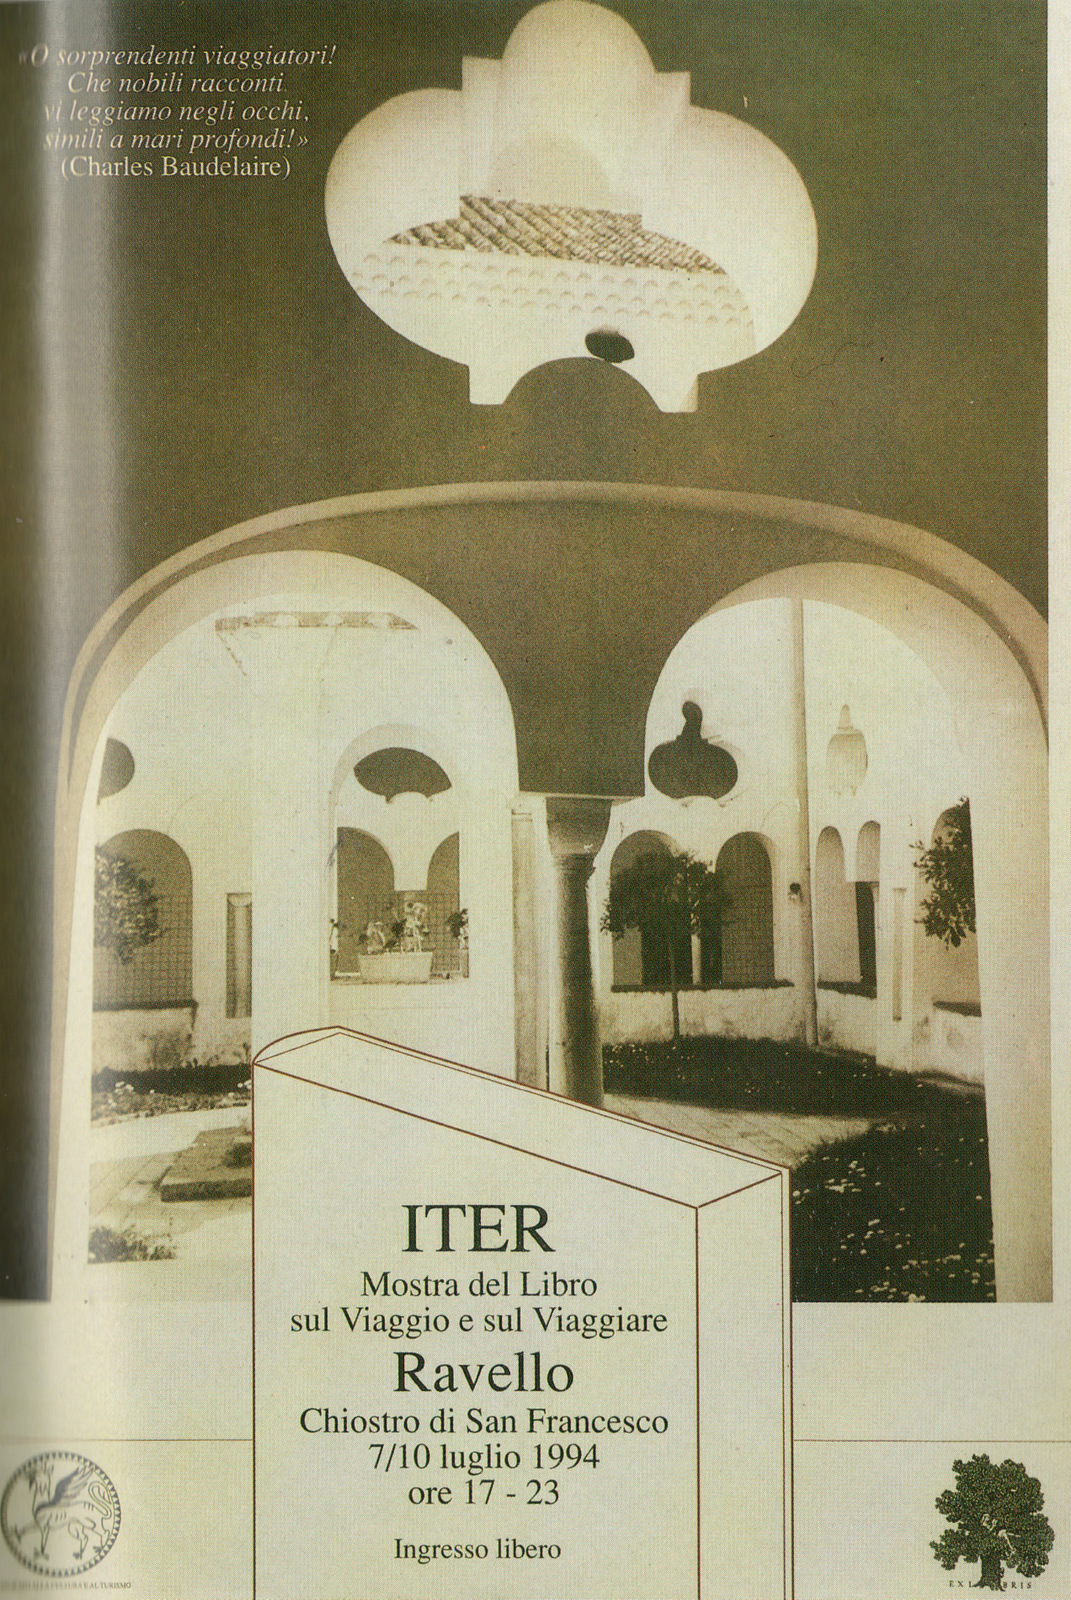 Mostra Iter, 1994